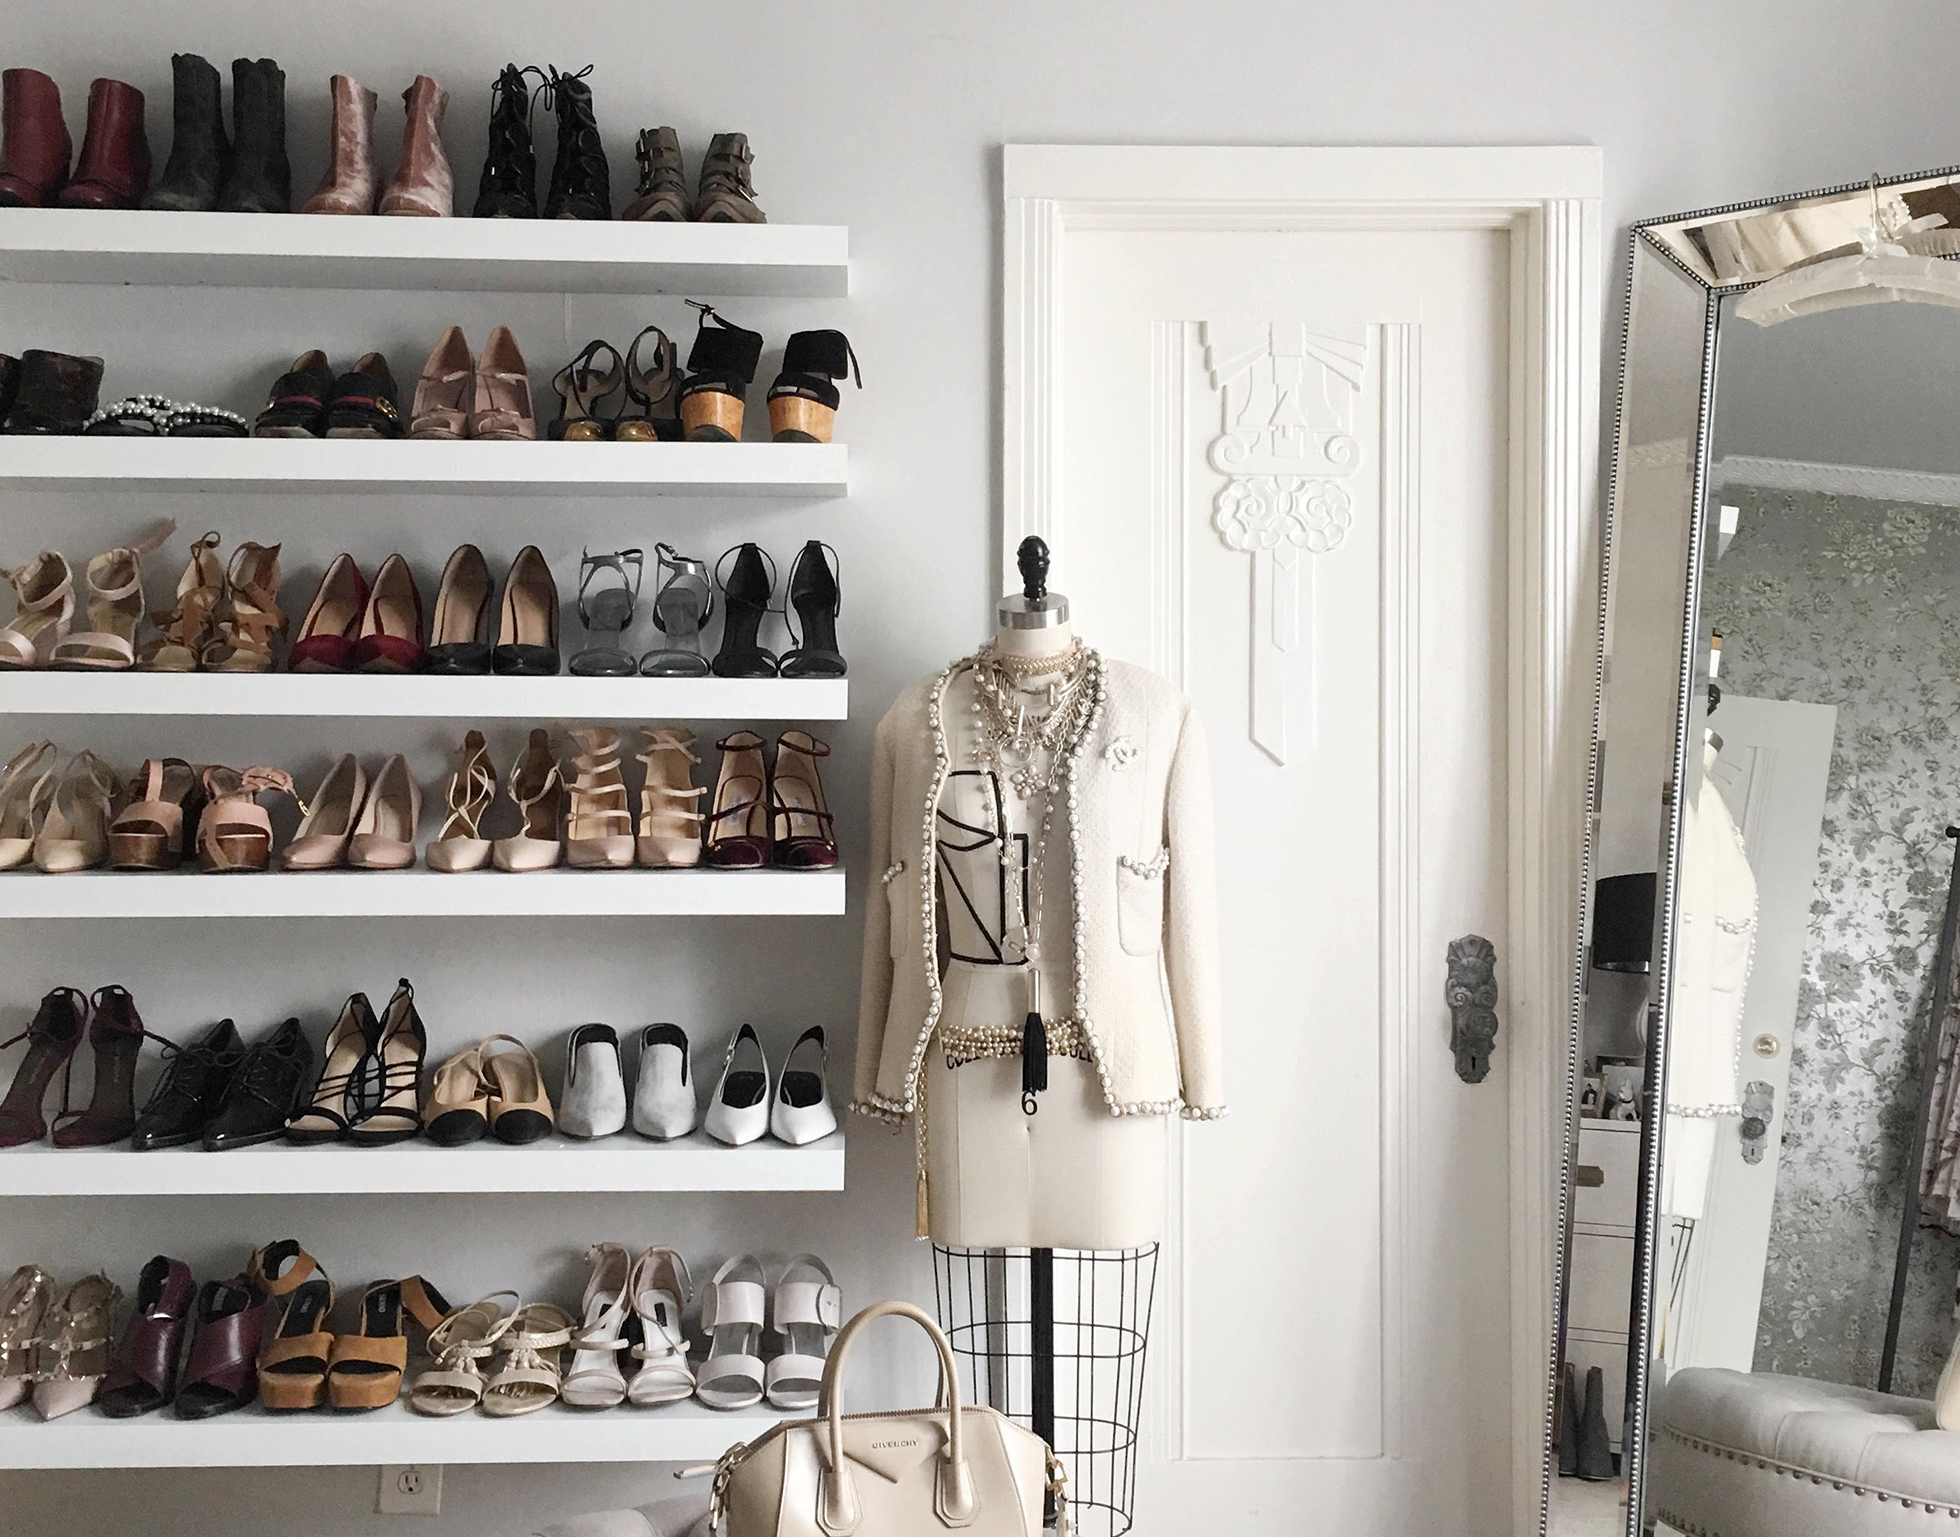 youtube video: inside my shoe closet | margo u0026 me BUJQBTI